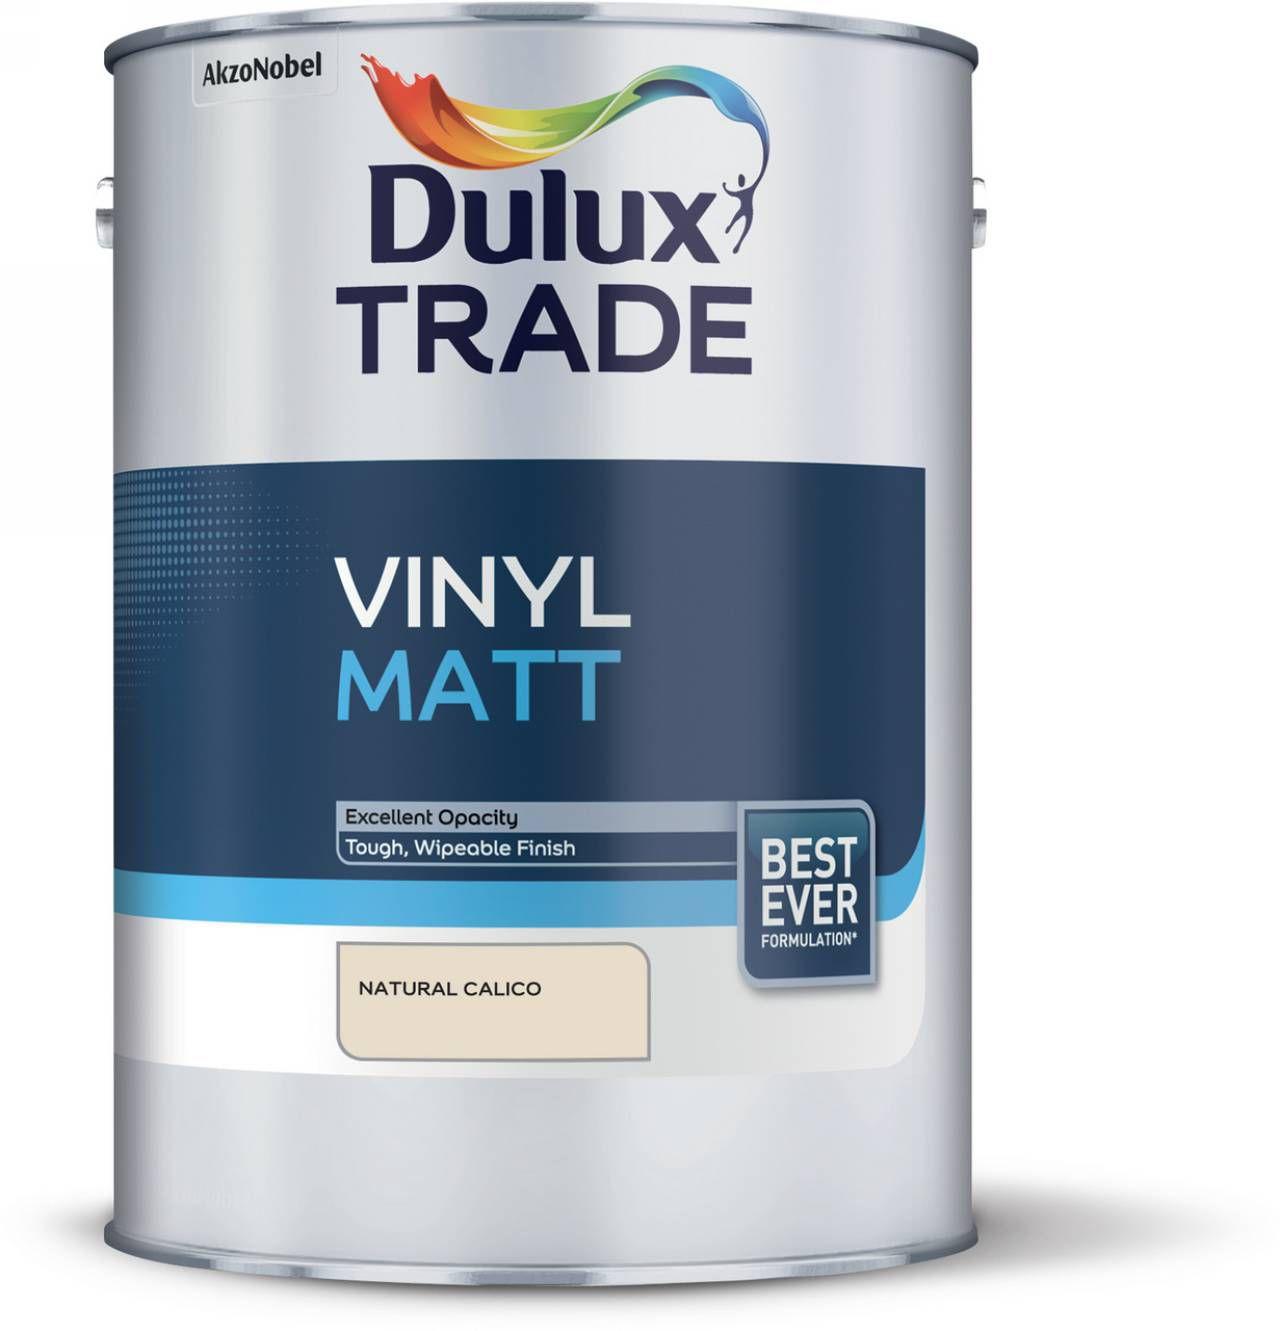 dulux trade chic shadow matt vinyl paint 5l | departments | diy at b&q